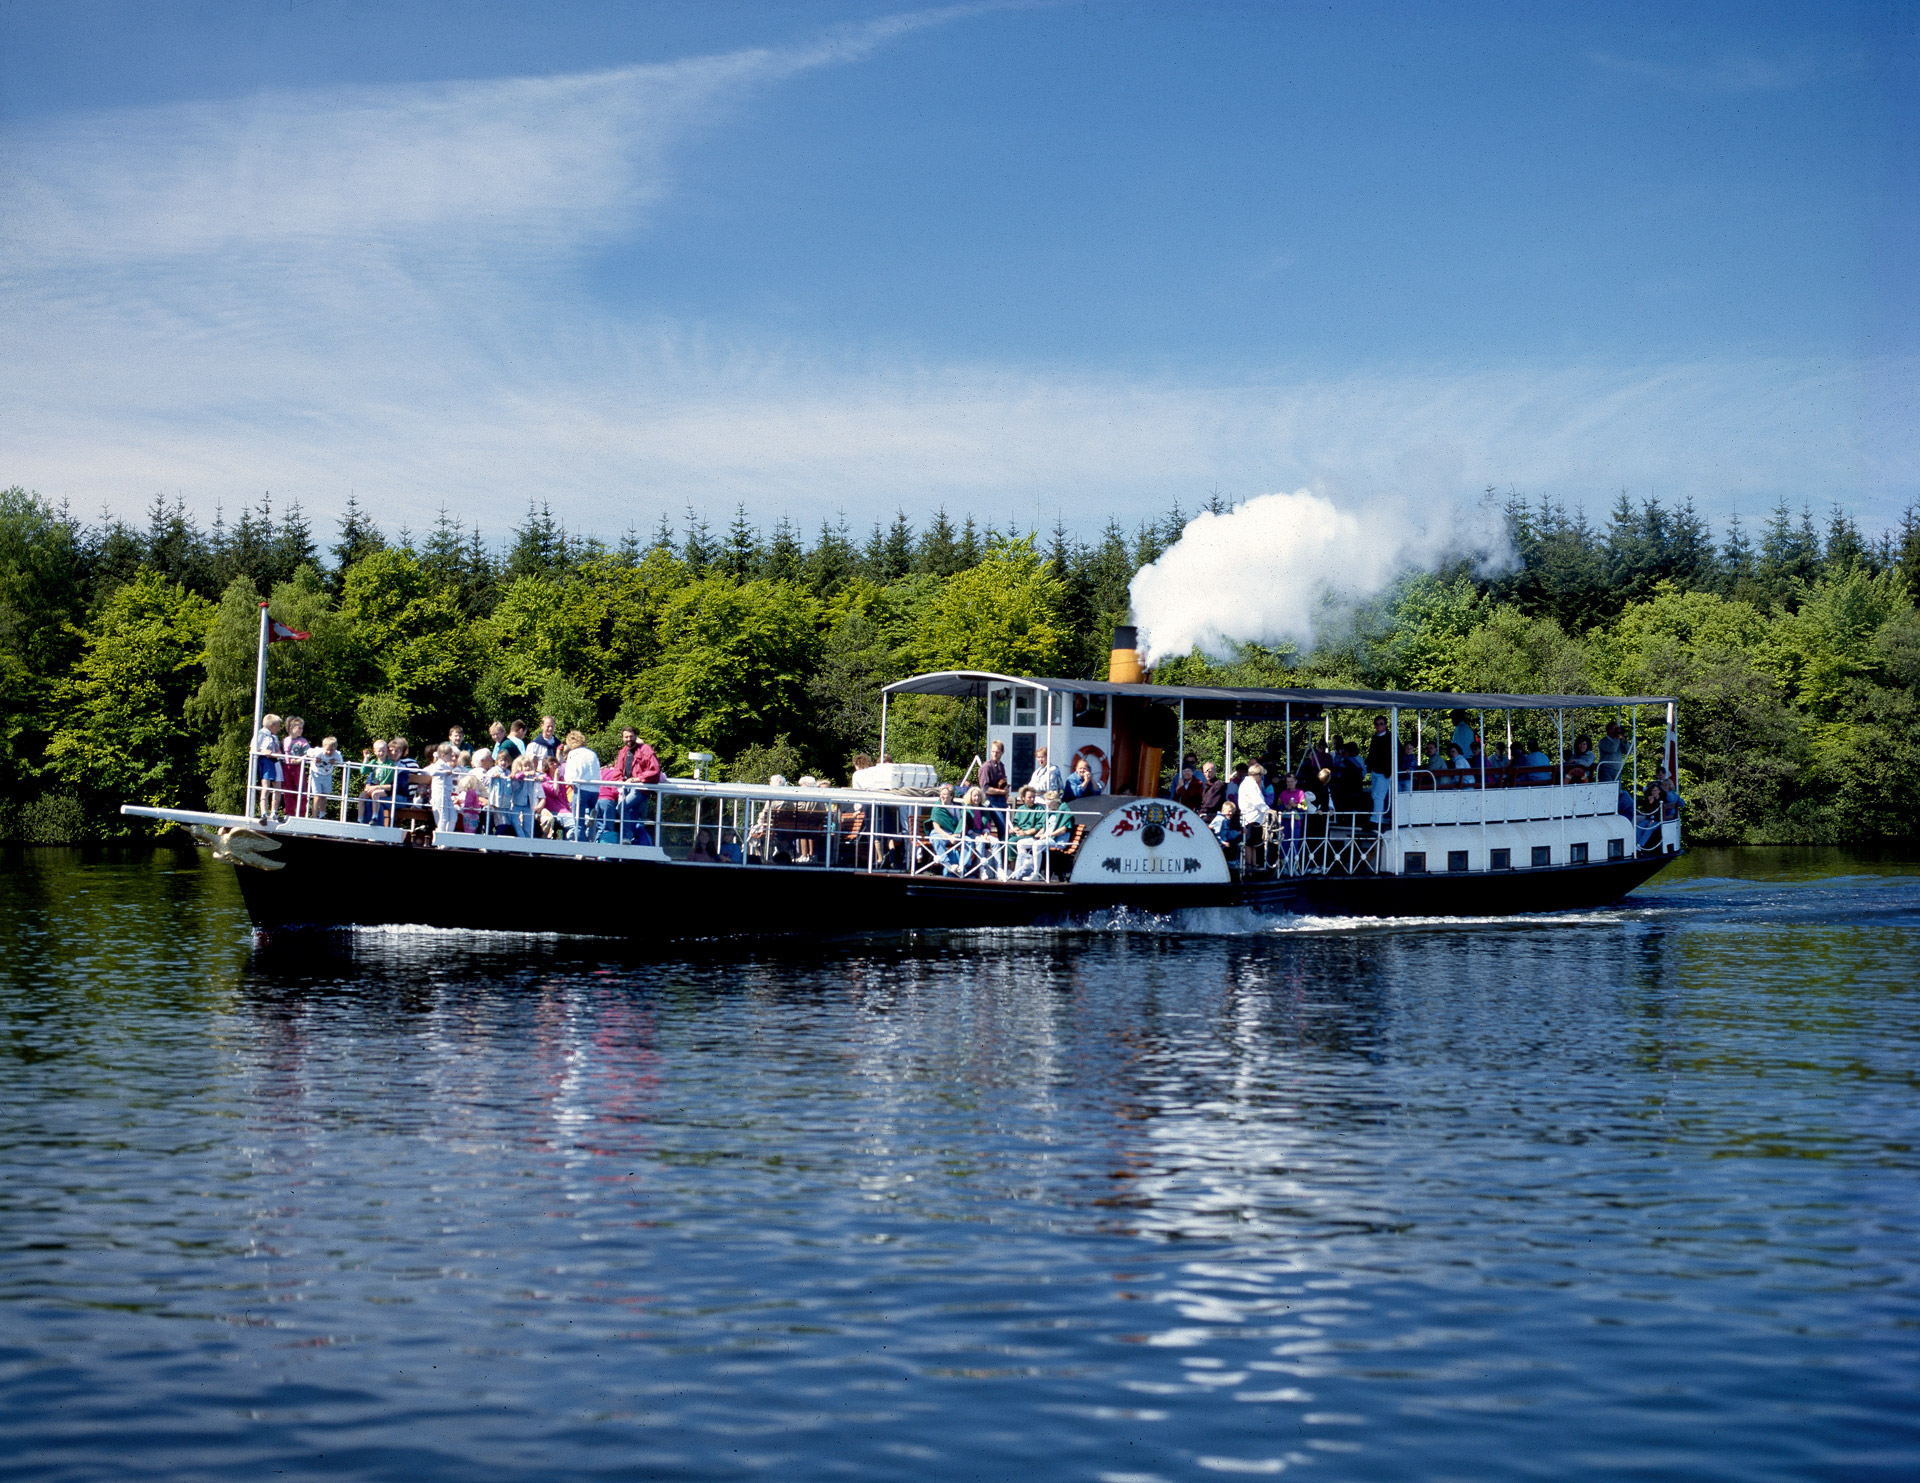 Hjejlen the oldest steam-ship in Denmark